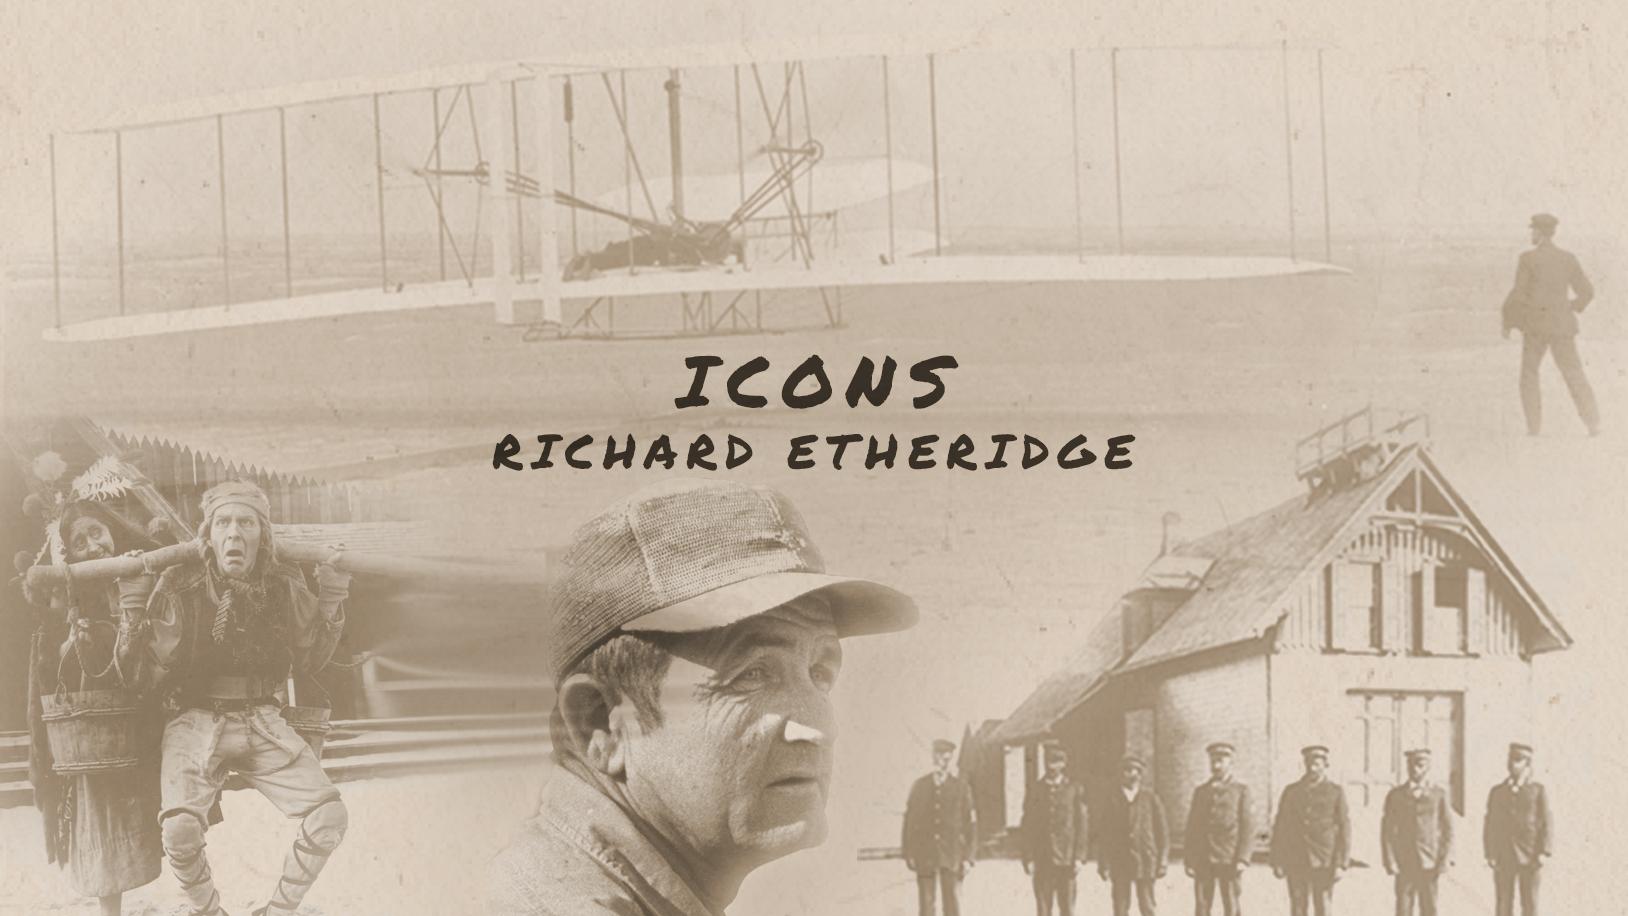 Icons of the Outer Banks Richard Etheridge